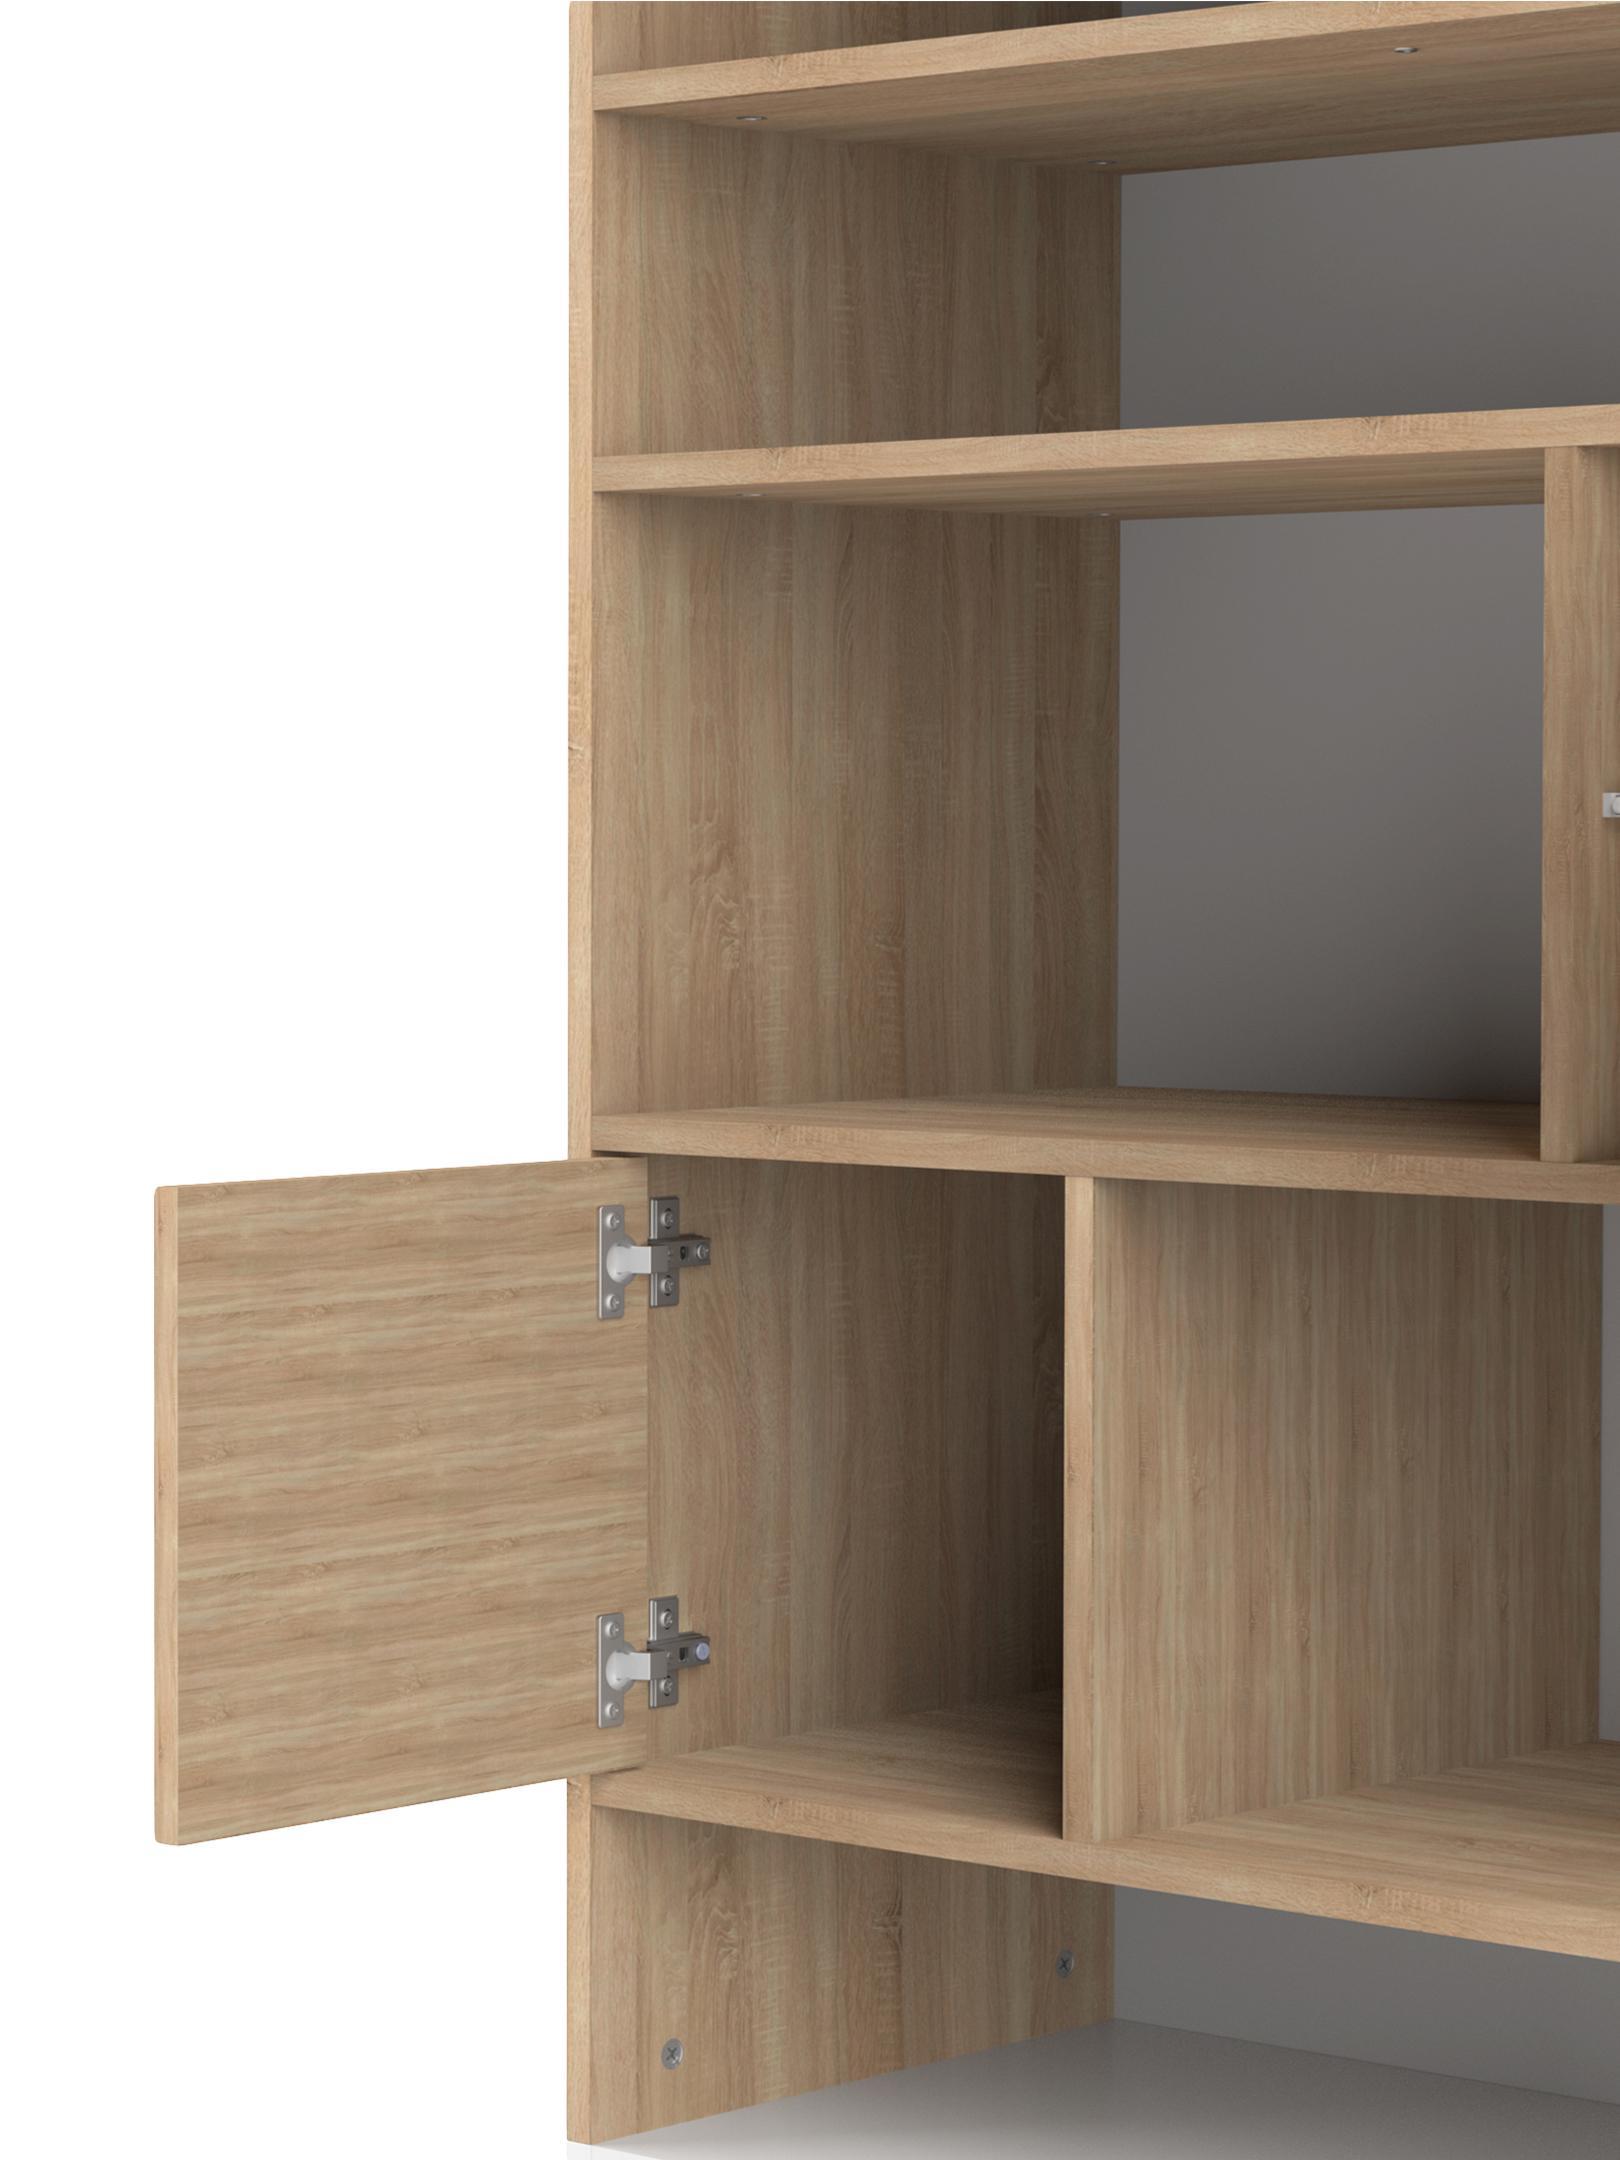 Standregal Horizon im Skandi Design, Korpus: Spanplatte, melaminbeschi, Füße: Buchenholz, massiv, lacki, Eichenholz, Weiß, 90 x 180 cm